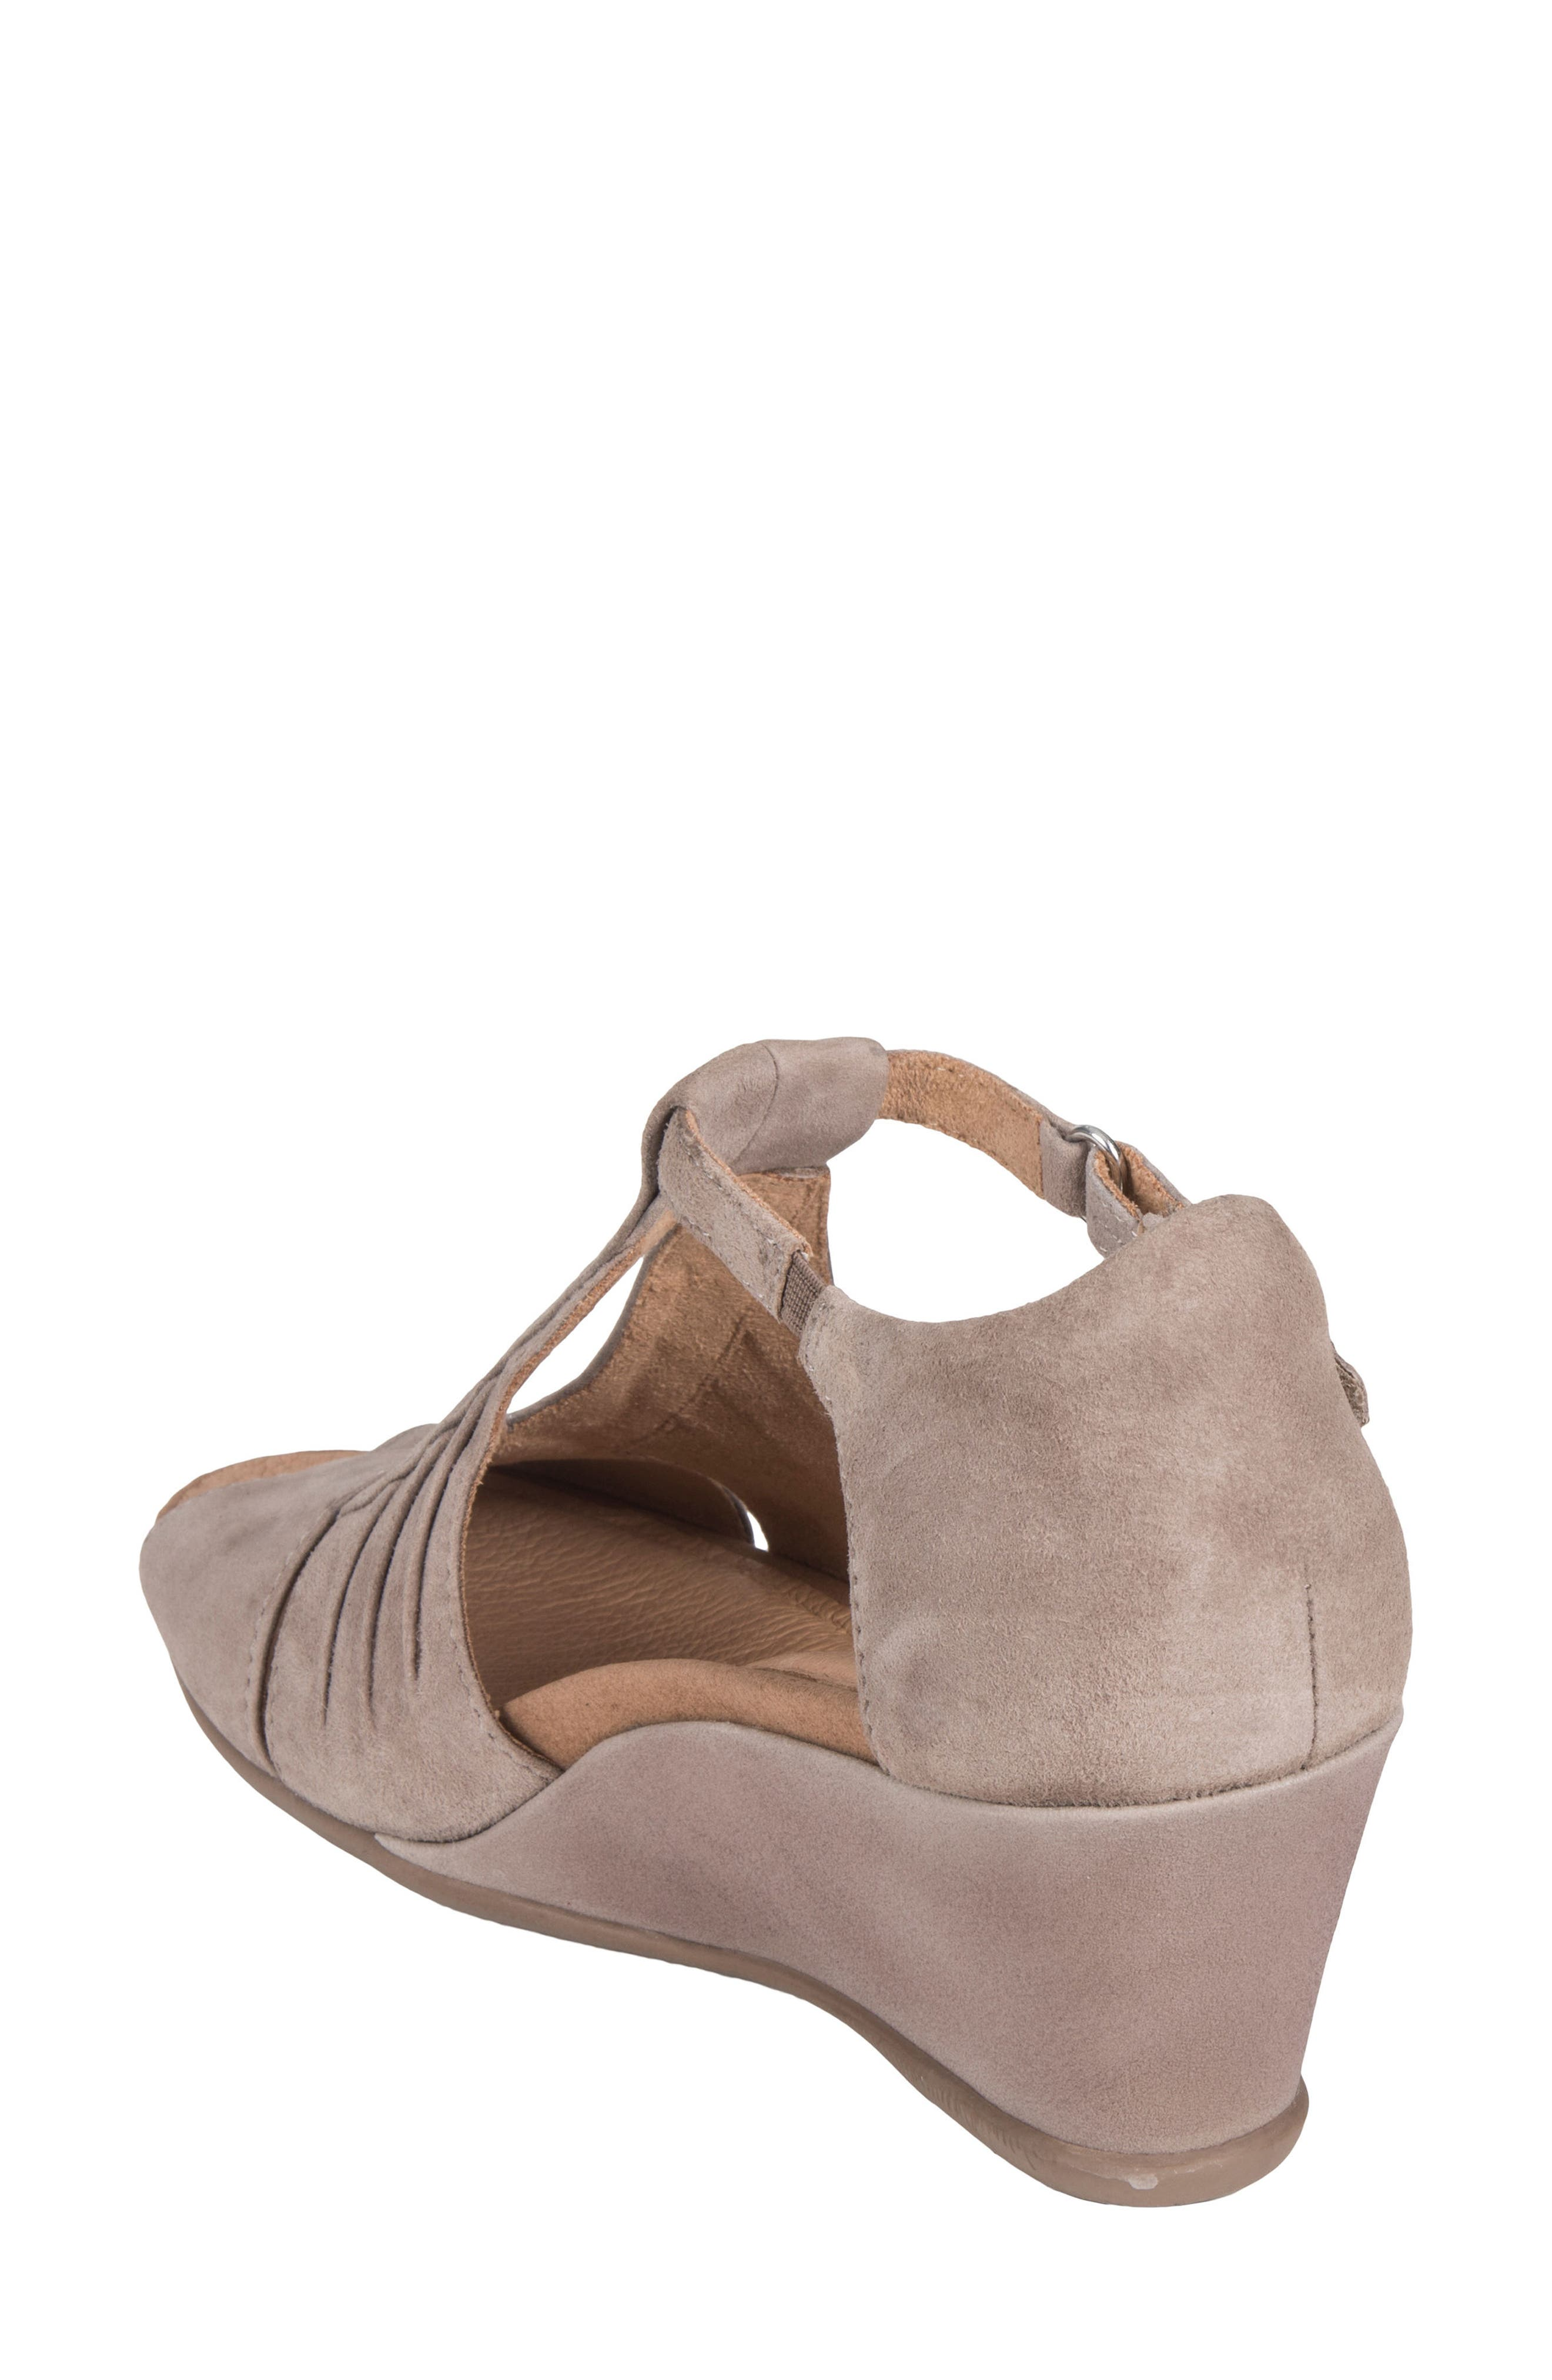 Primrose Wedge Sandal,                             Alternate thumbnail 2, color,                             Ginger Suede